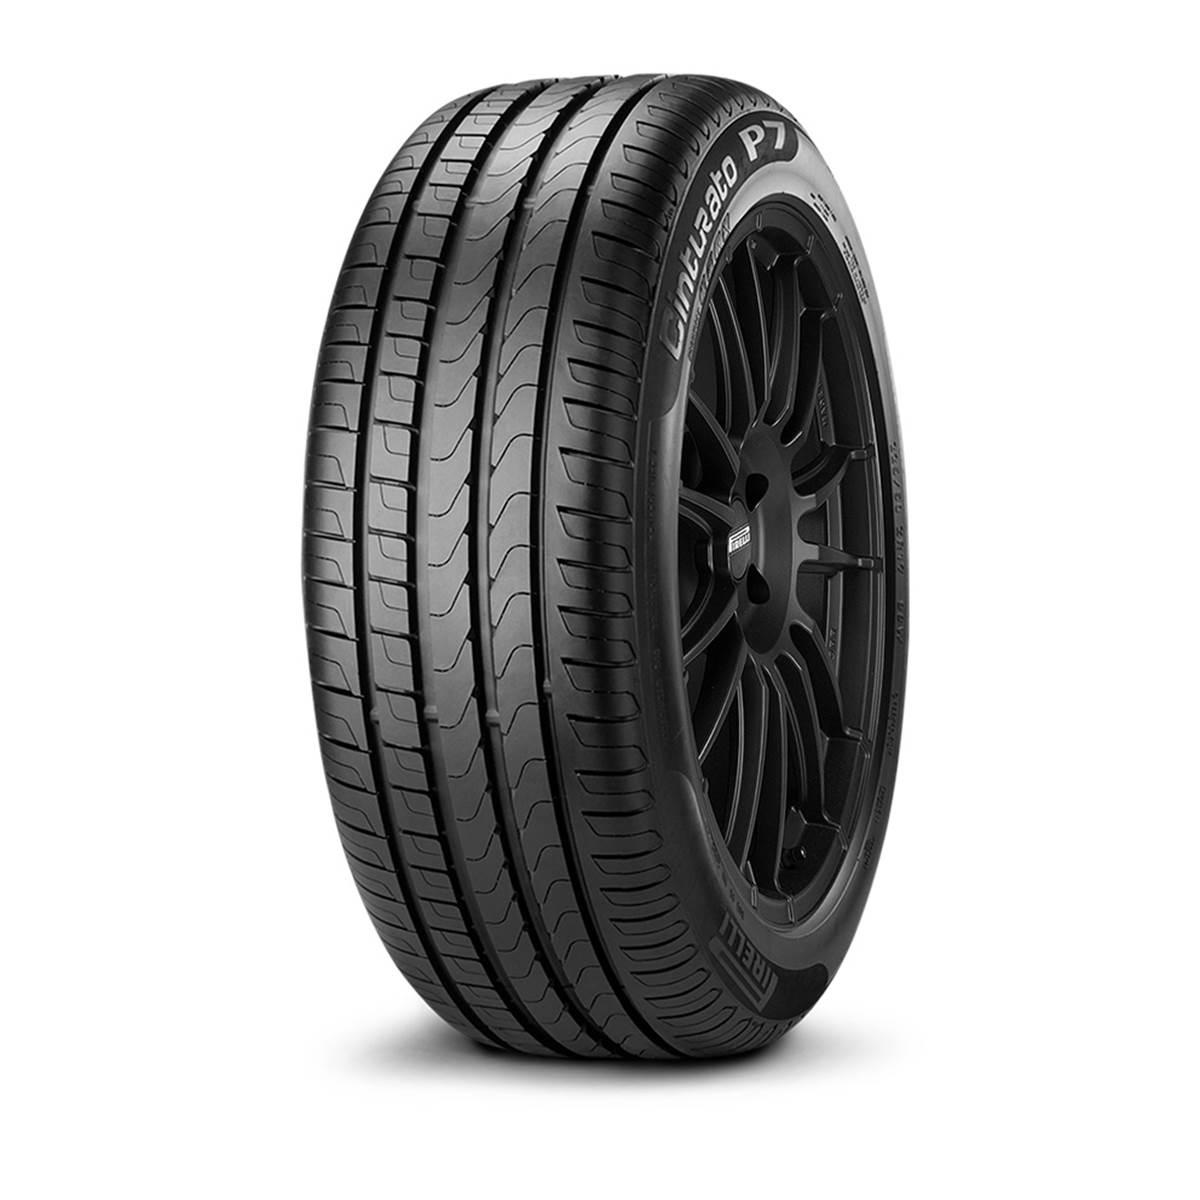 Pneu Pirelli 225/45R18 95W Cinturato P7 XL